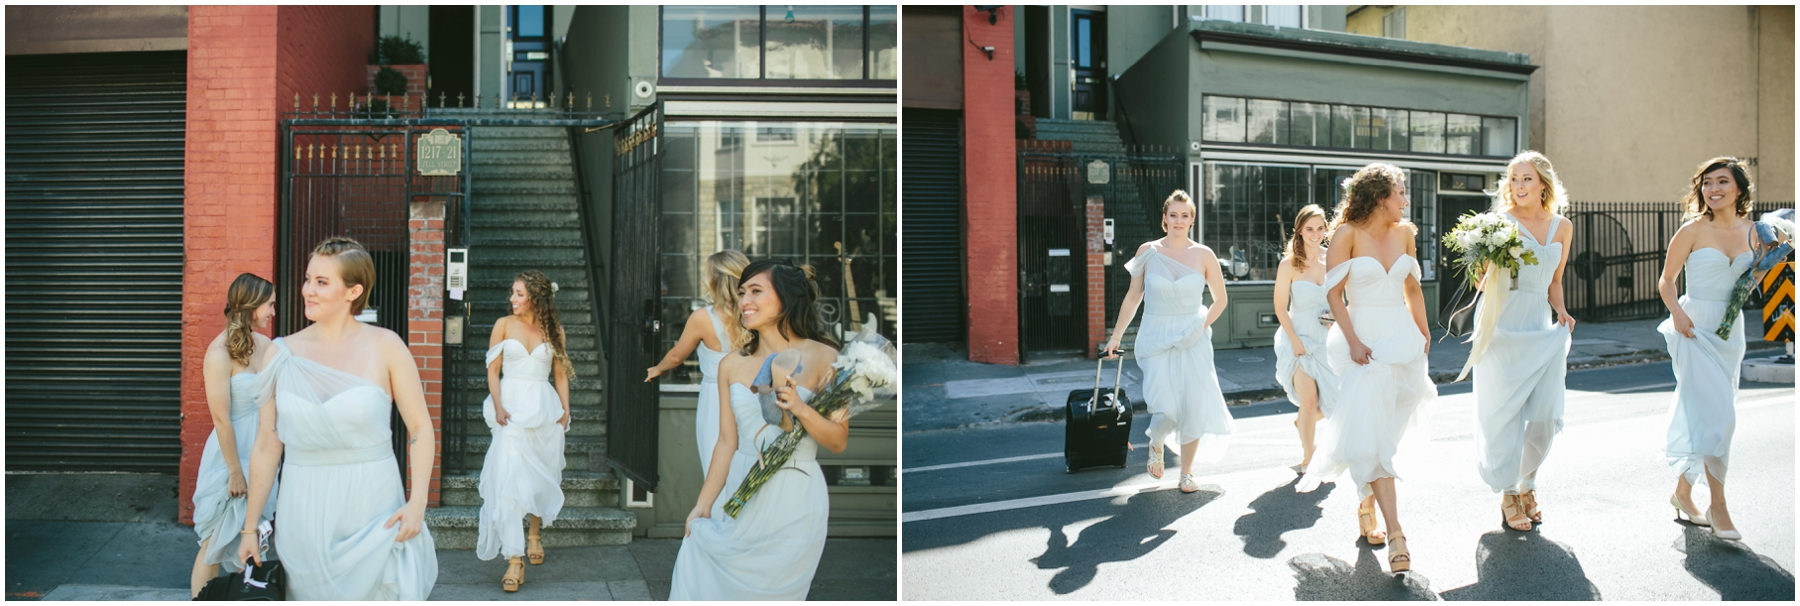 Emily+Paul-WEDDING_KellyBoitanoPhotography_0025